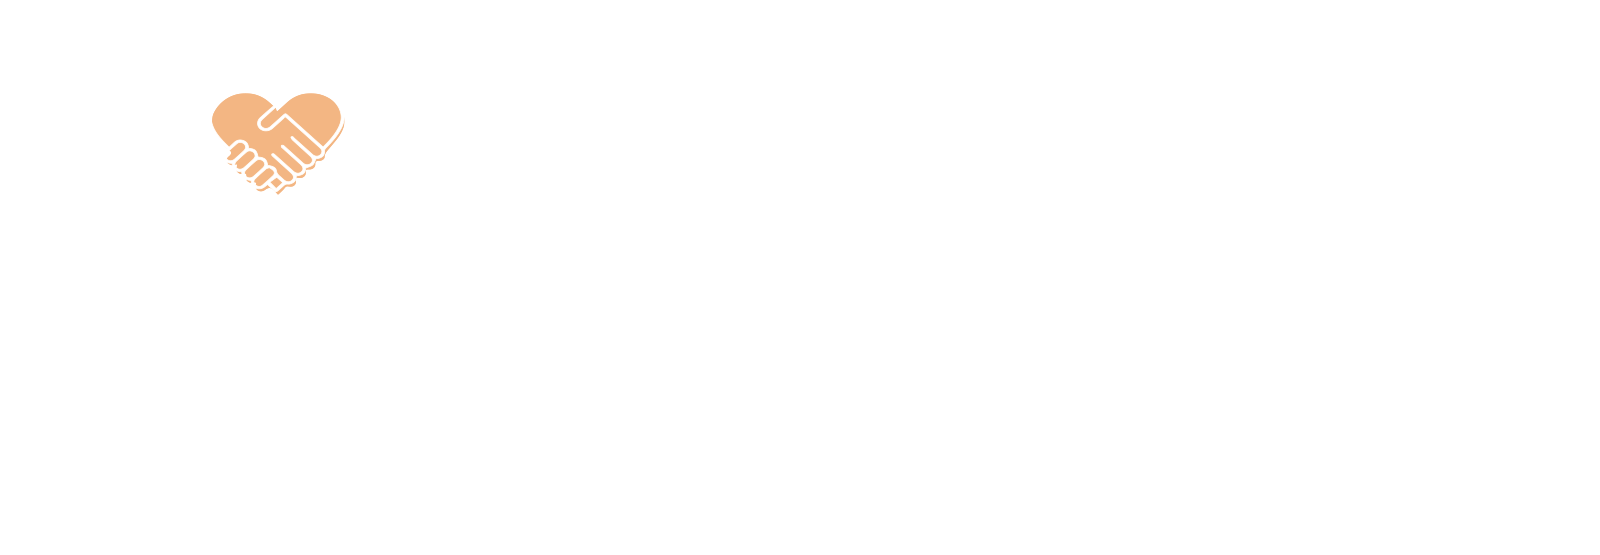 G.A.P. Mission Partner Benefits Chart - Horizontal